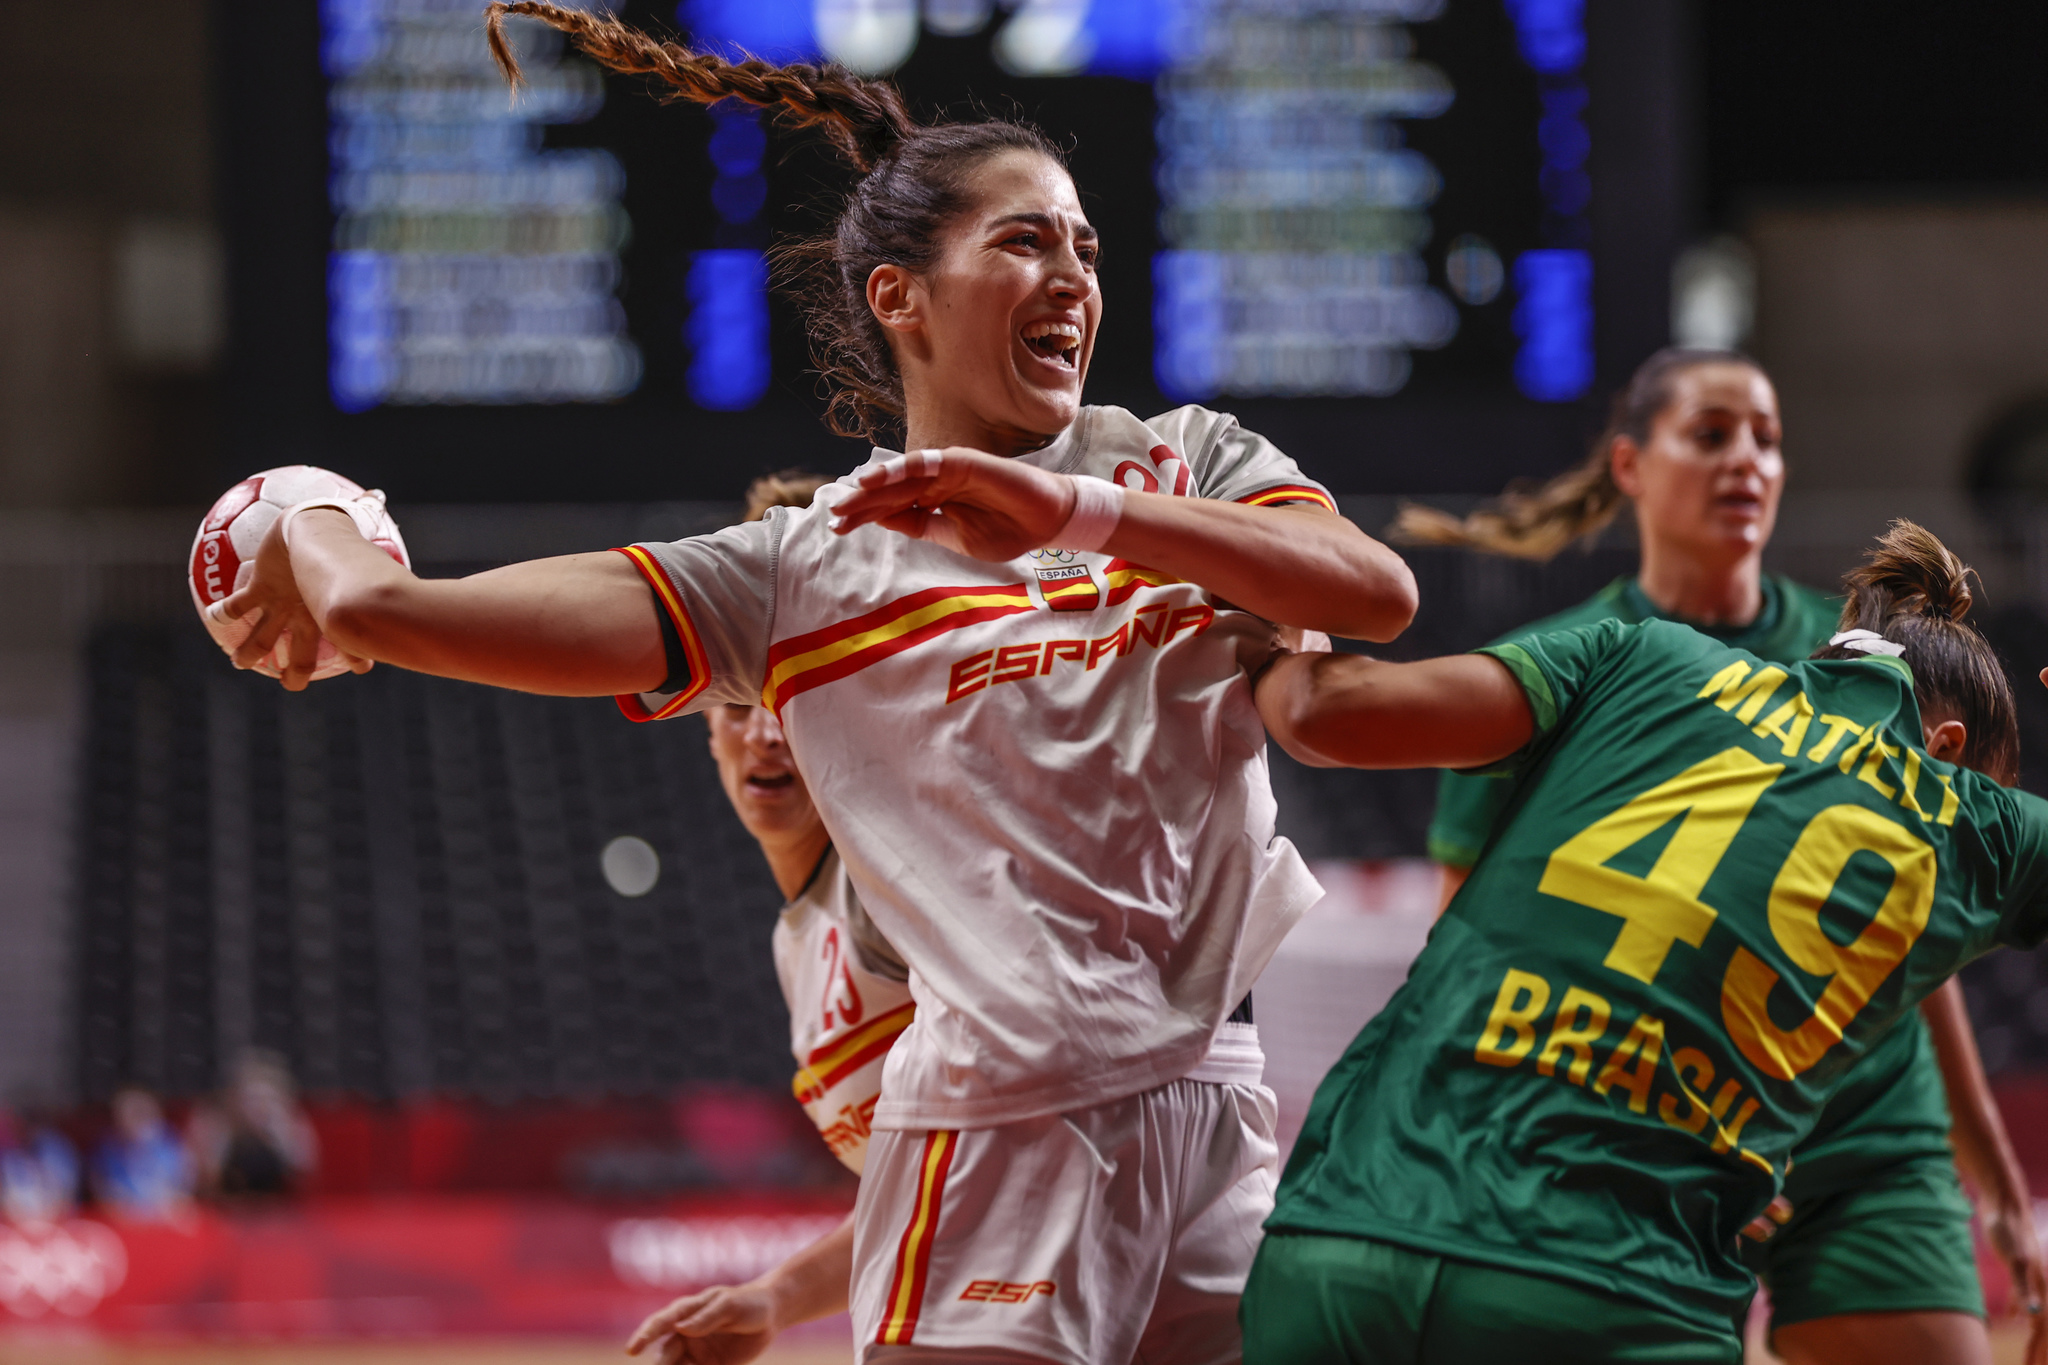 La española Lara González trata de lanzar ante Brasil /